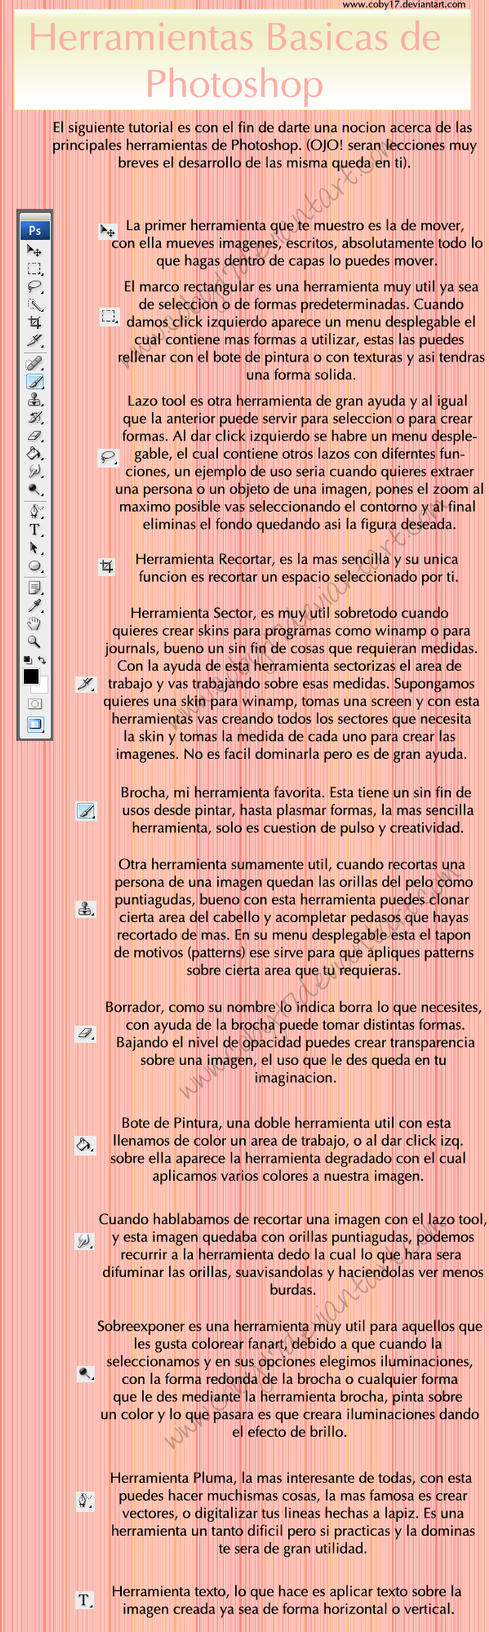 Herramientas Basicas PS by Coby17